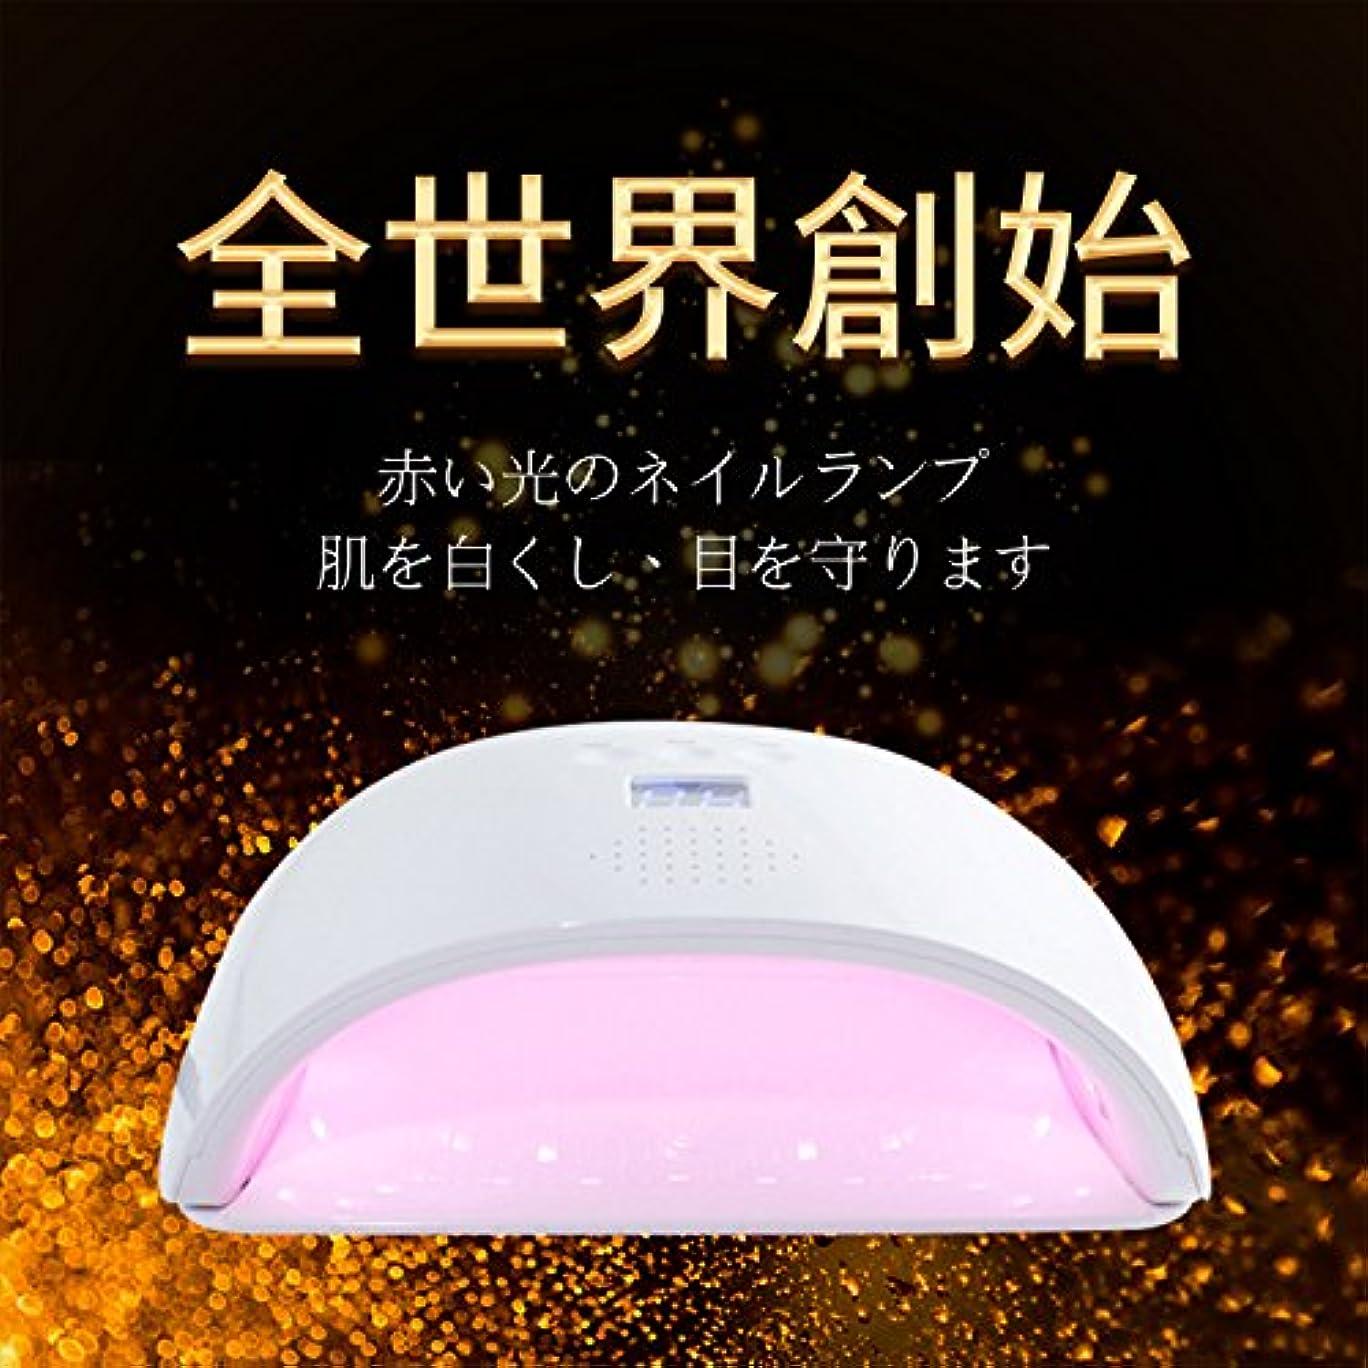 Halicer 48W UV LED ネイルドライヤー 人感センサー 自動オンオフ 30S/60S/90Sタイマー設定 取り外し式 手と足両用 22粒UV LDEダブルライト